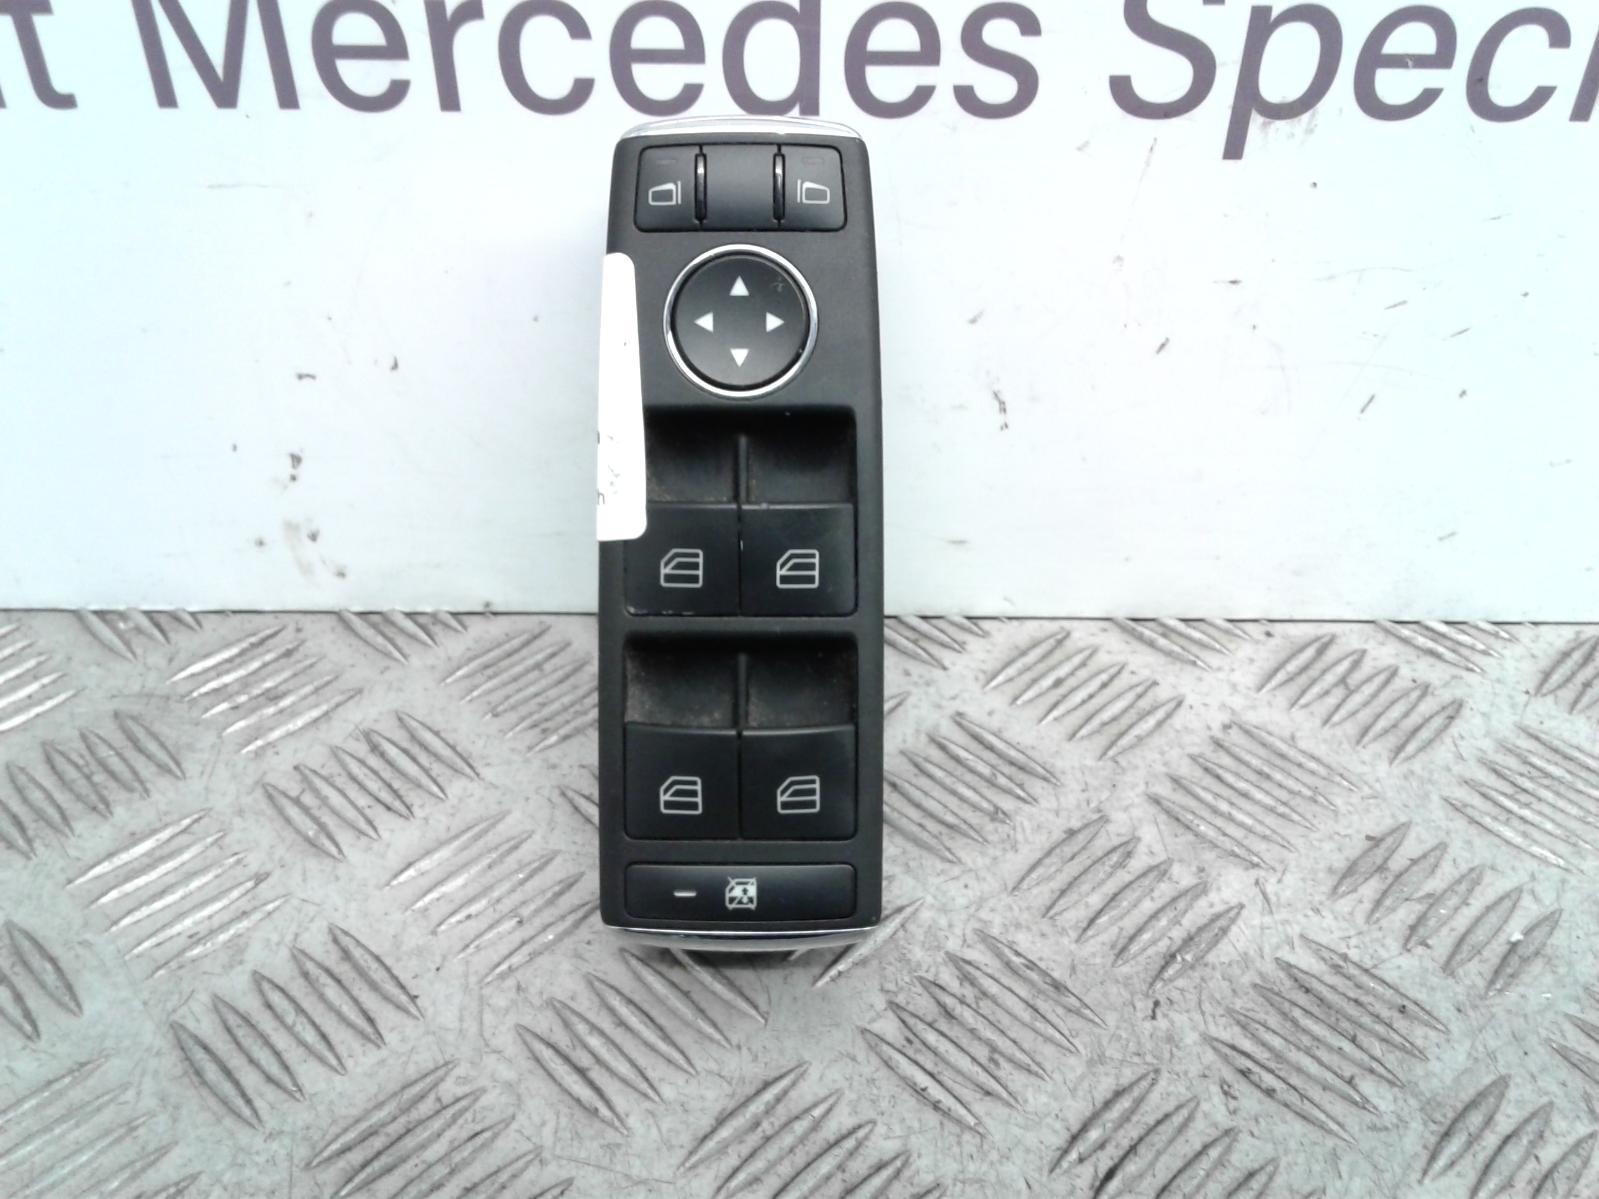 View Auto part Elect. Window Switch Mercedes C Class 2010